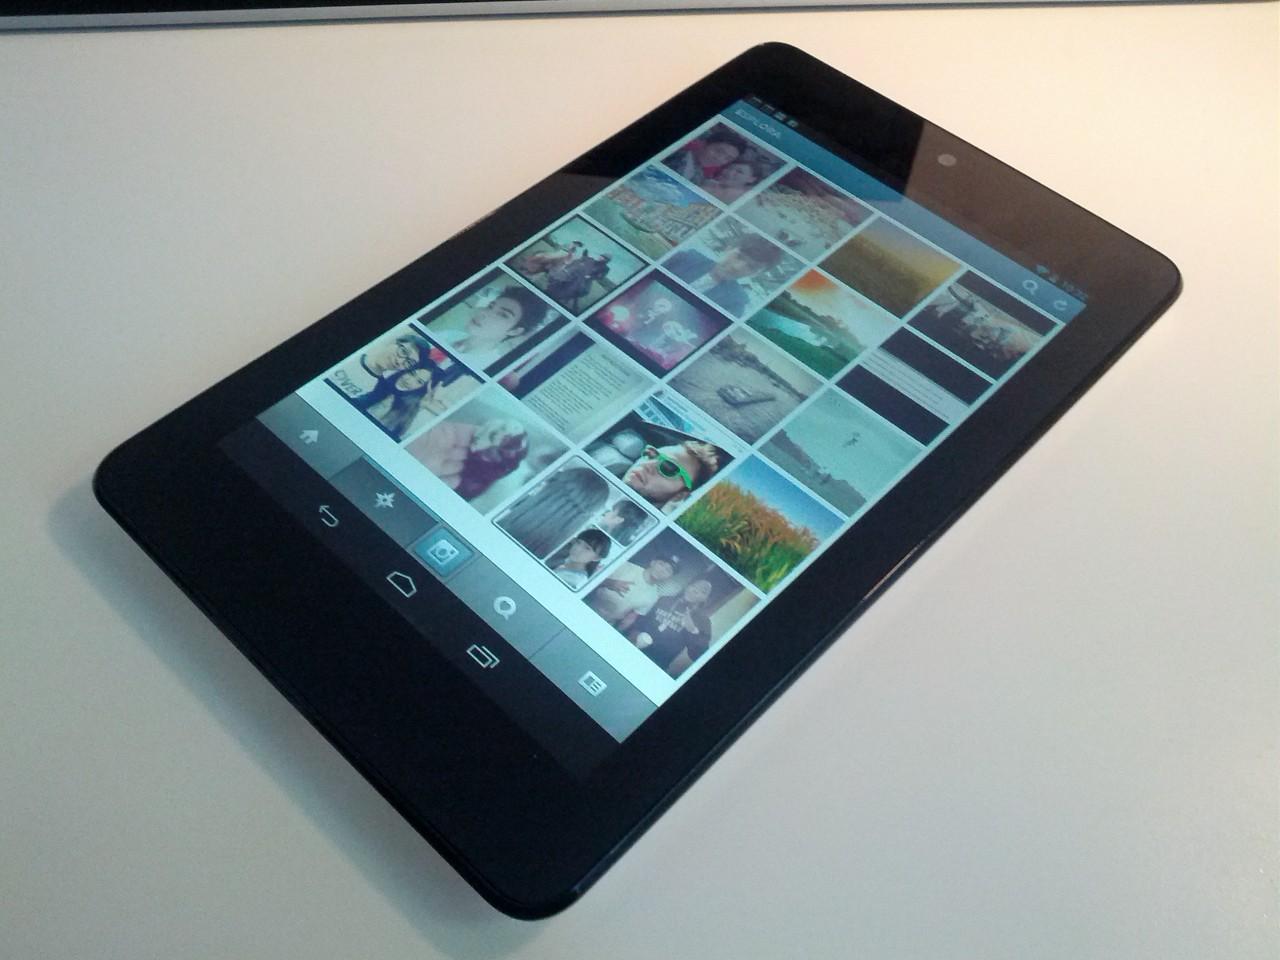 Instagram per Nexus 7